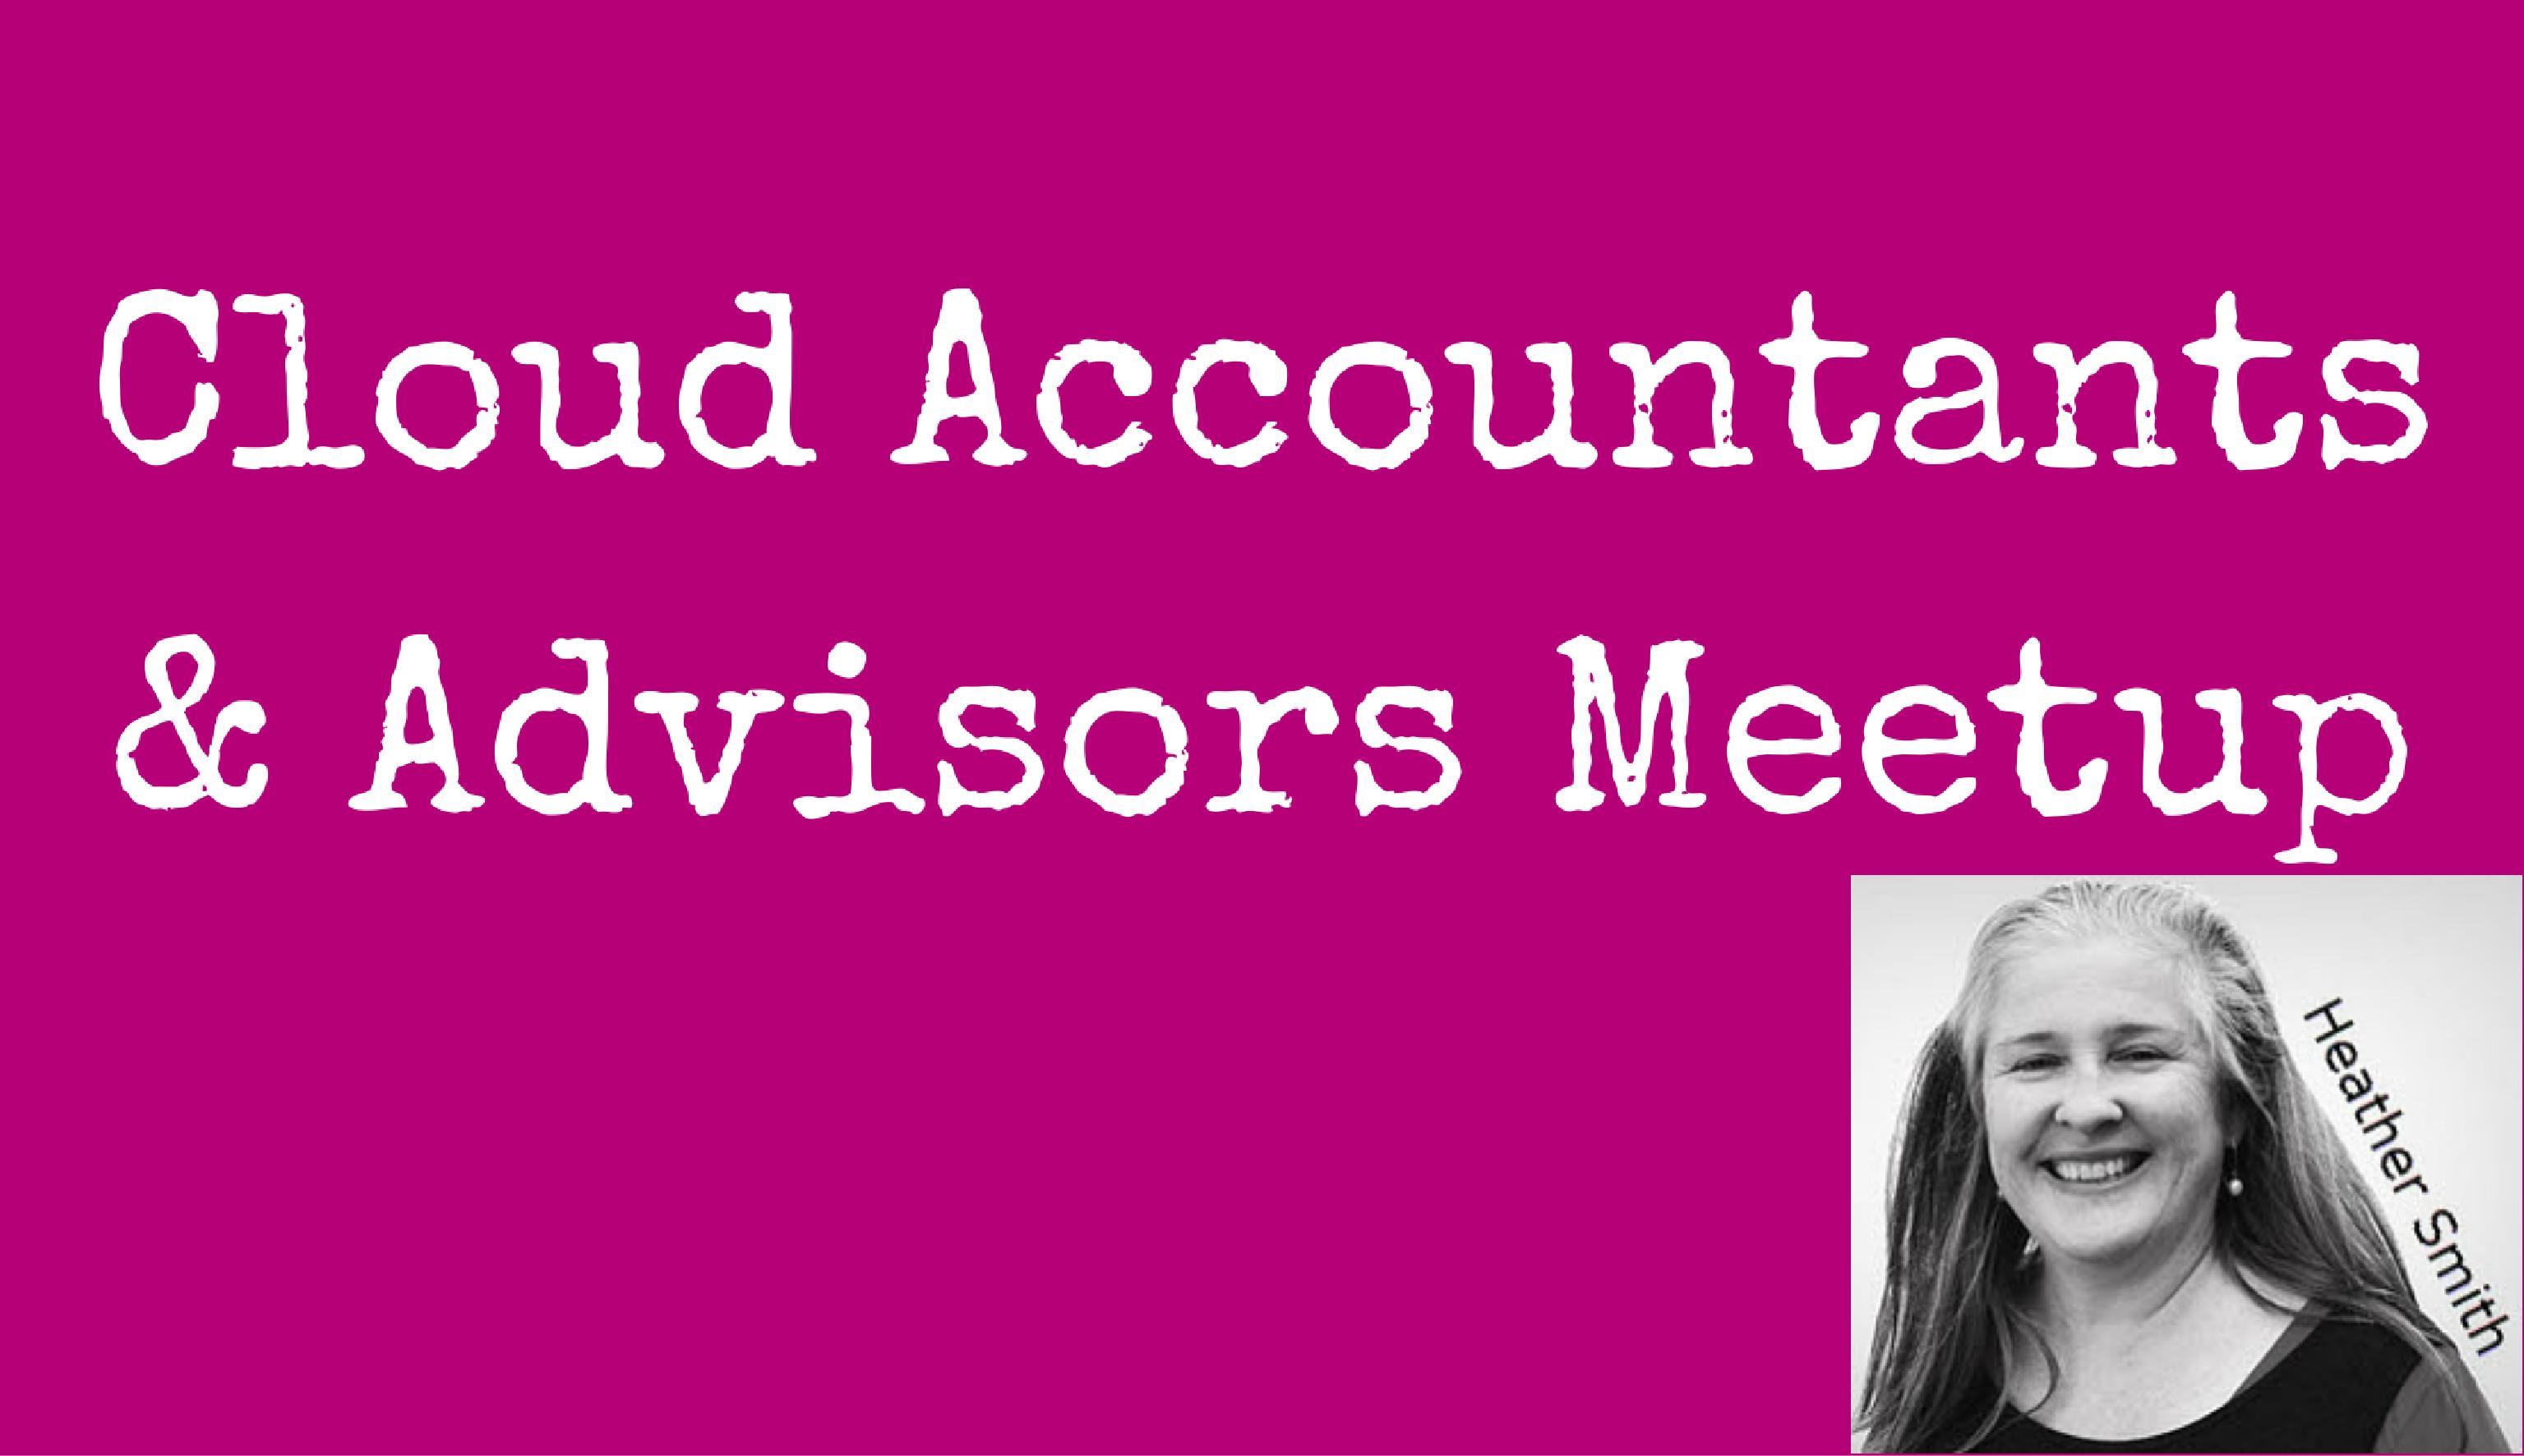 Cloud Accountants & Advisors Meetup